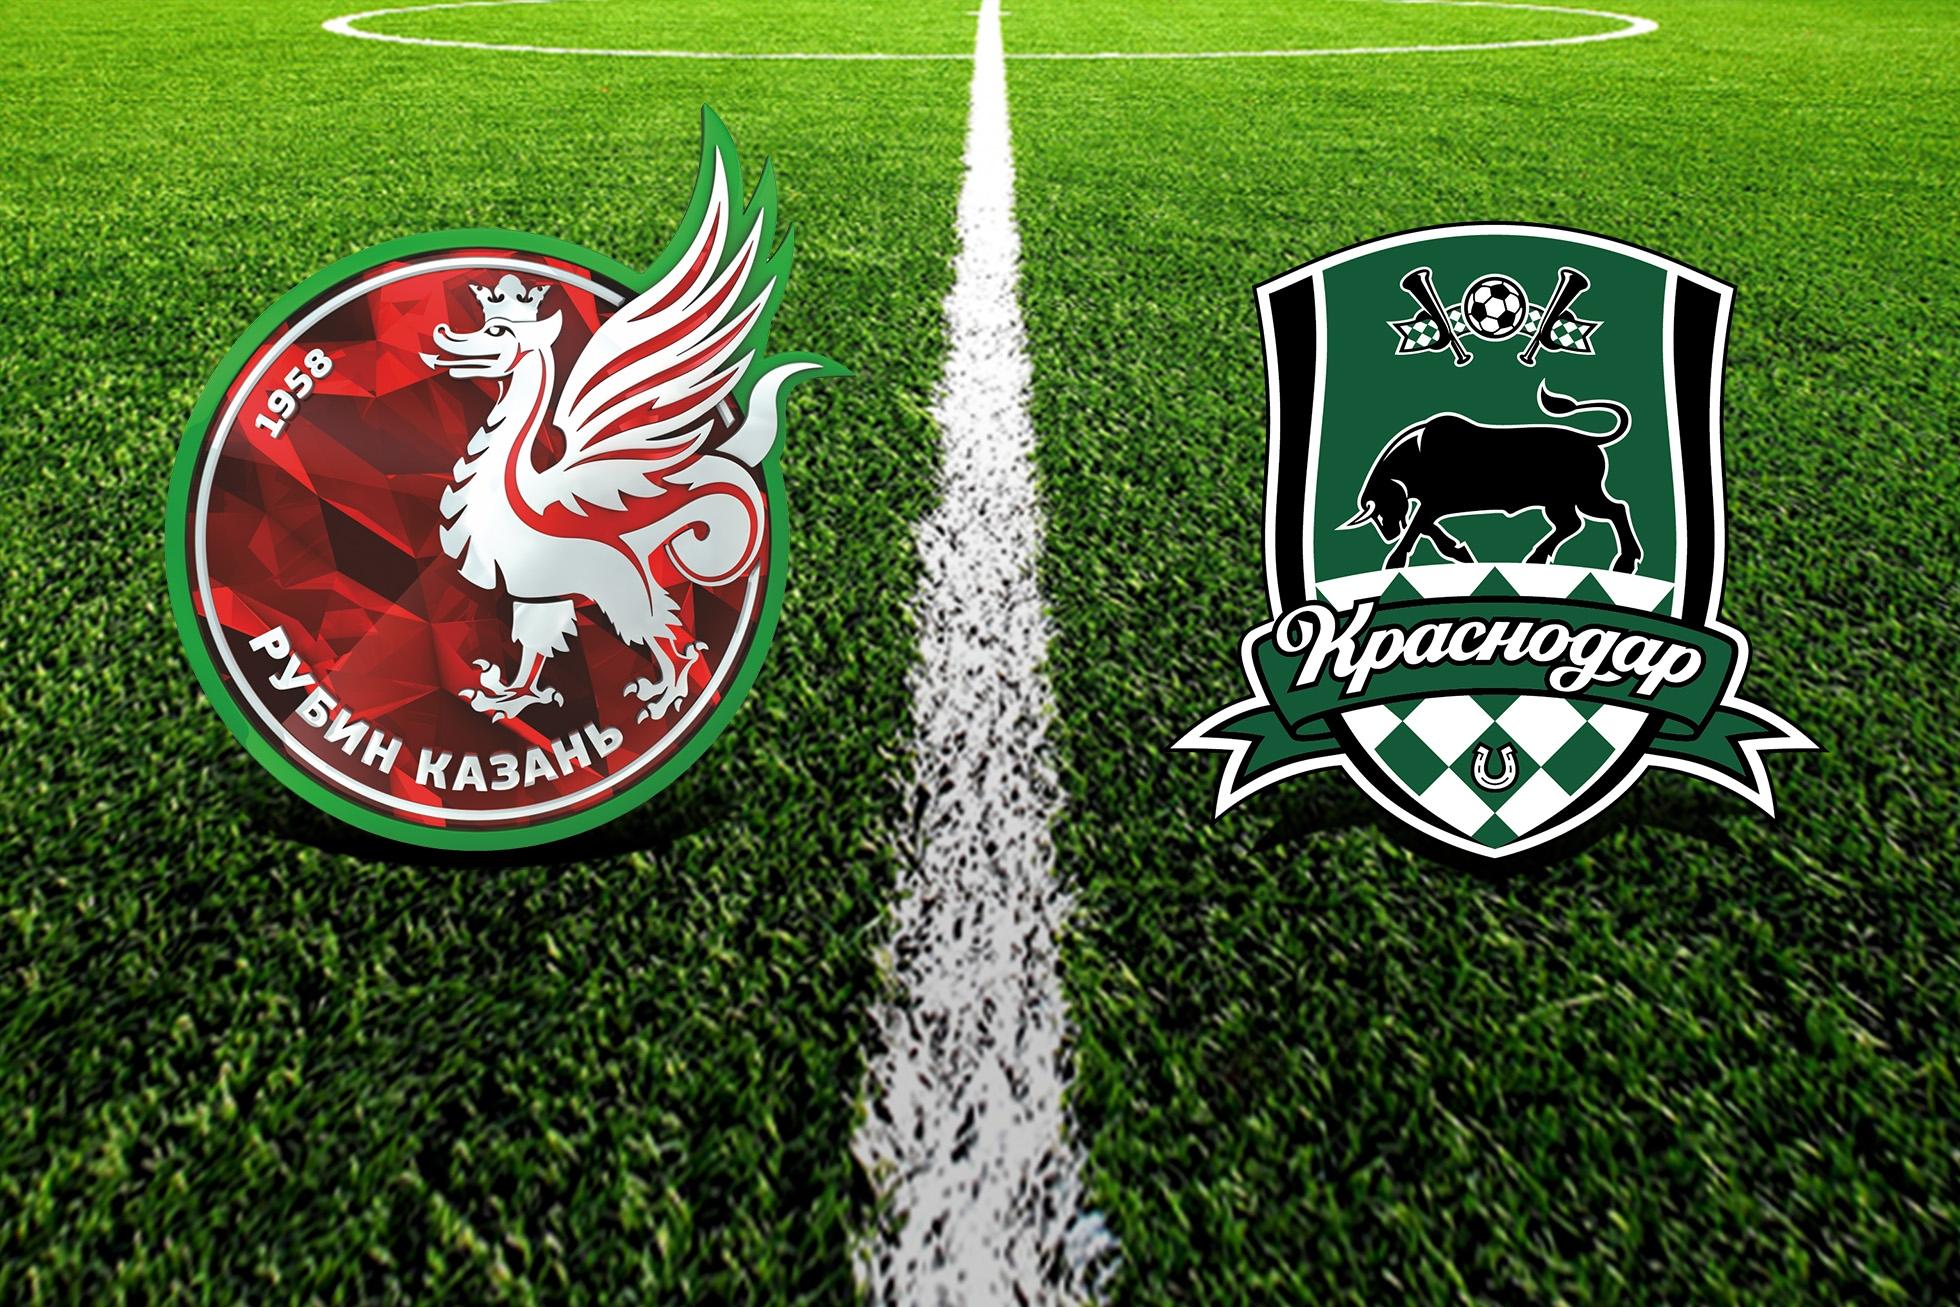 Трансляция матча Рубин — Краснодар, 15 апреля 2017